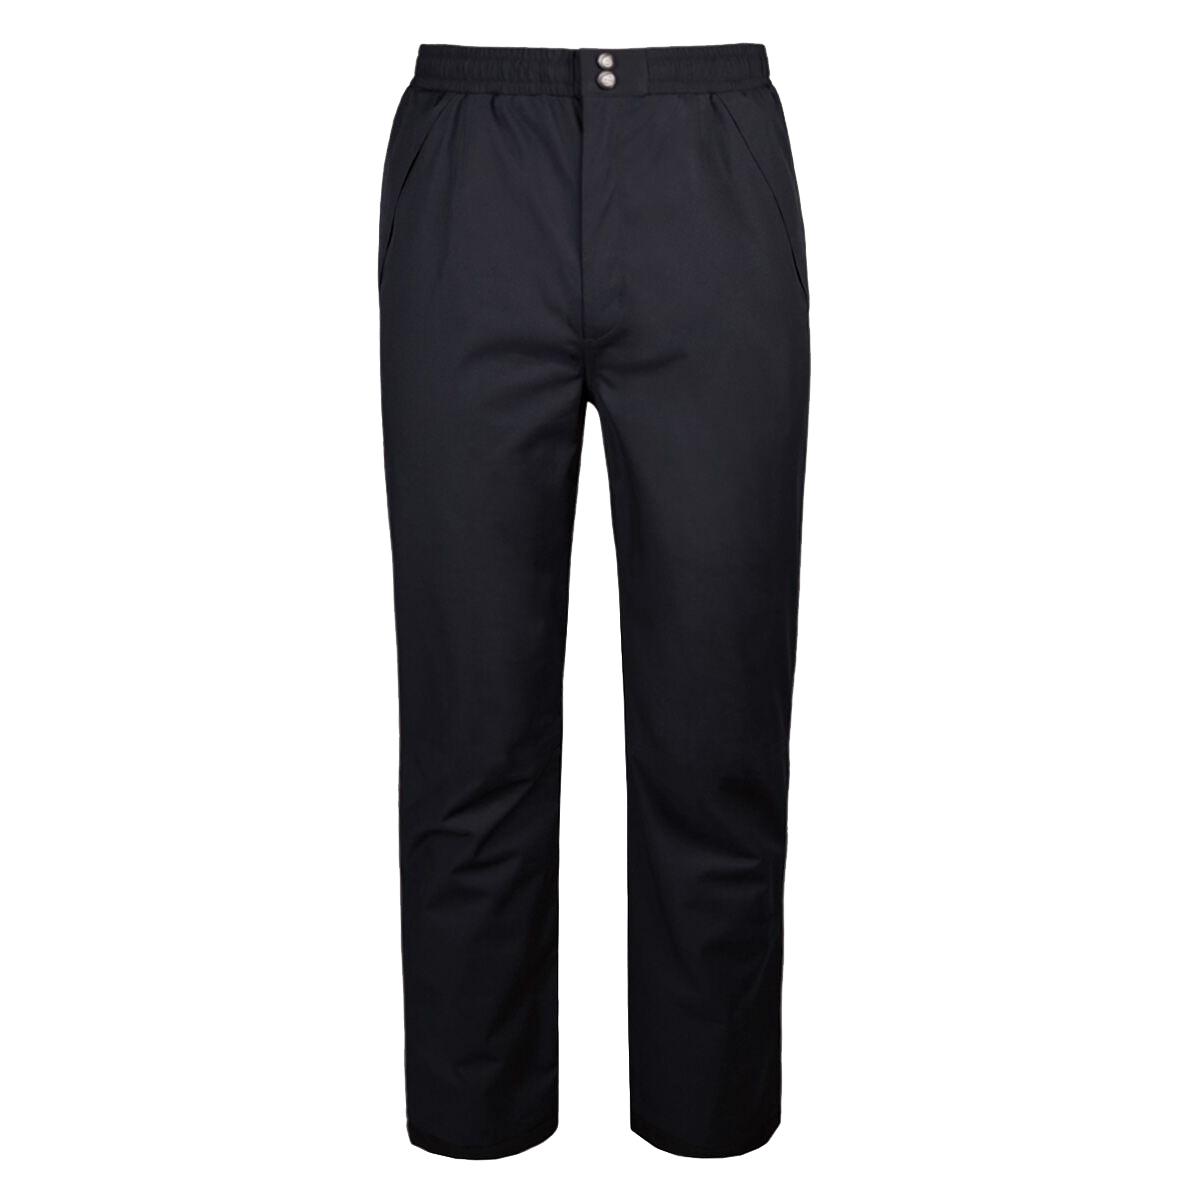 Sunderland Mens Lightweight Waterproof Trousers (XL/L) (Black)